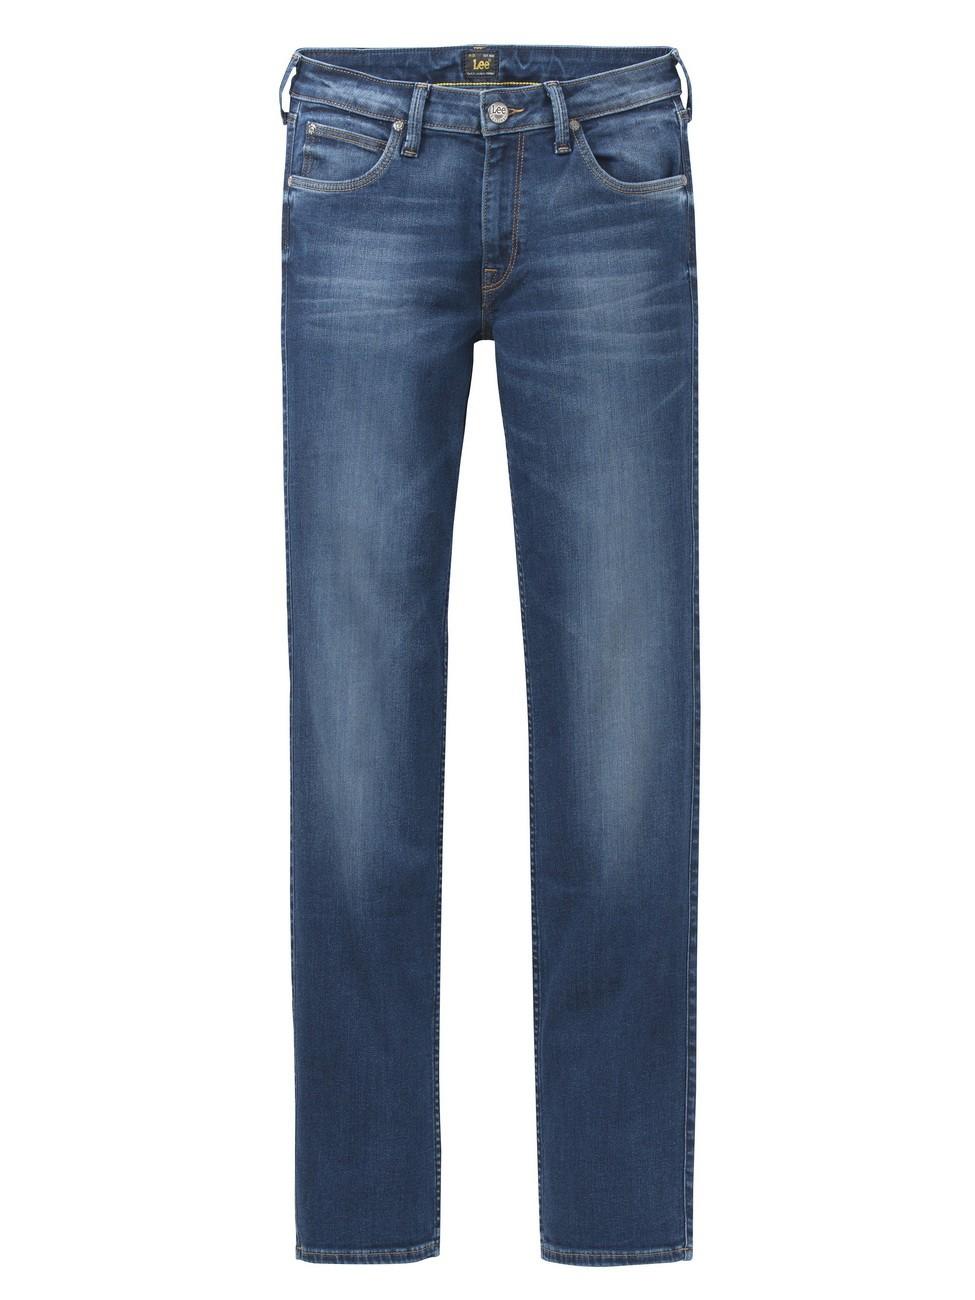 lee damen jeans scarlett skinny fit blau night sky ebay. Black Bedroom Furniture Sets. Home Design Ideas